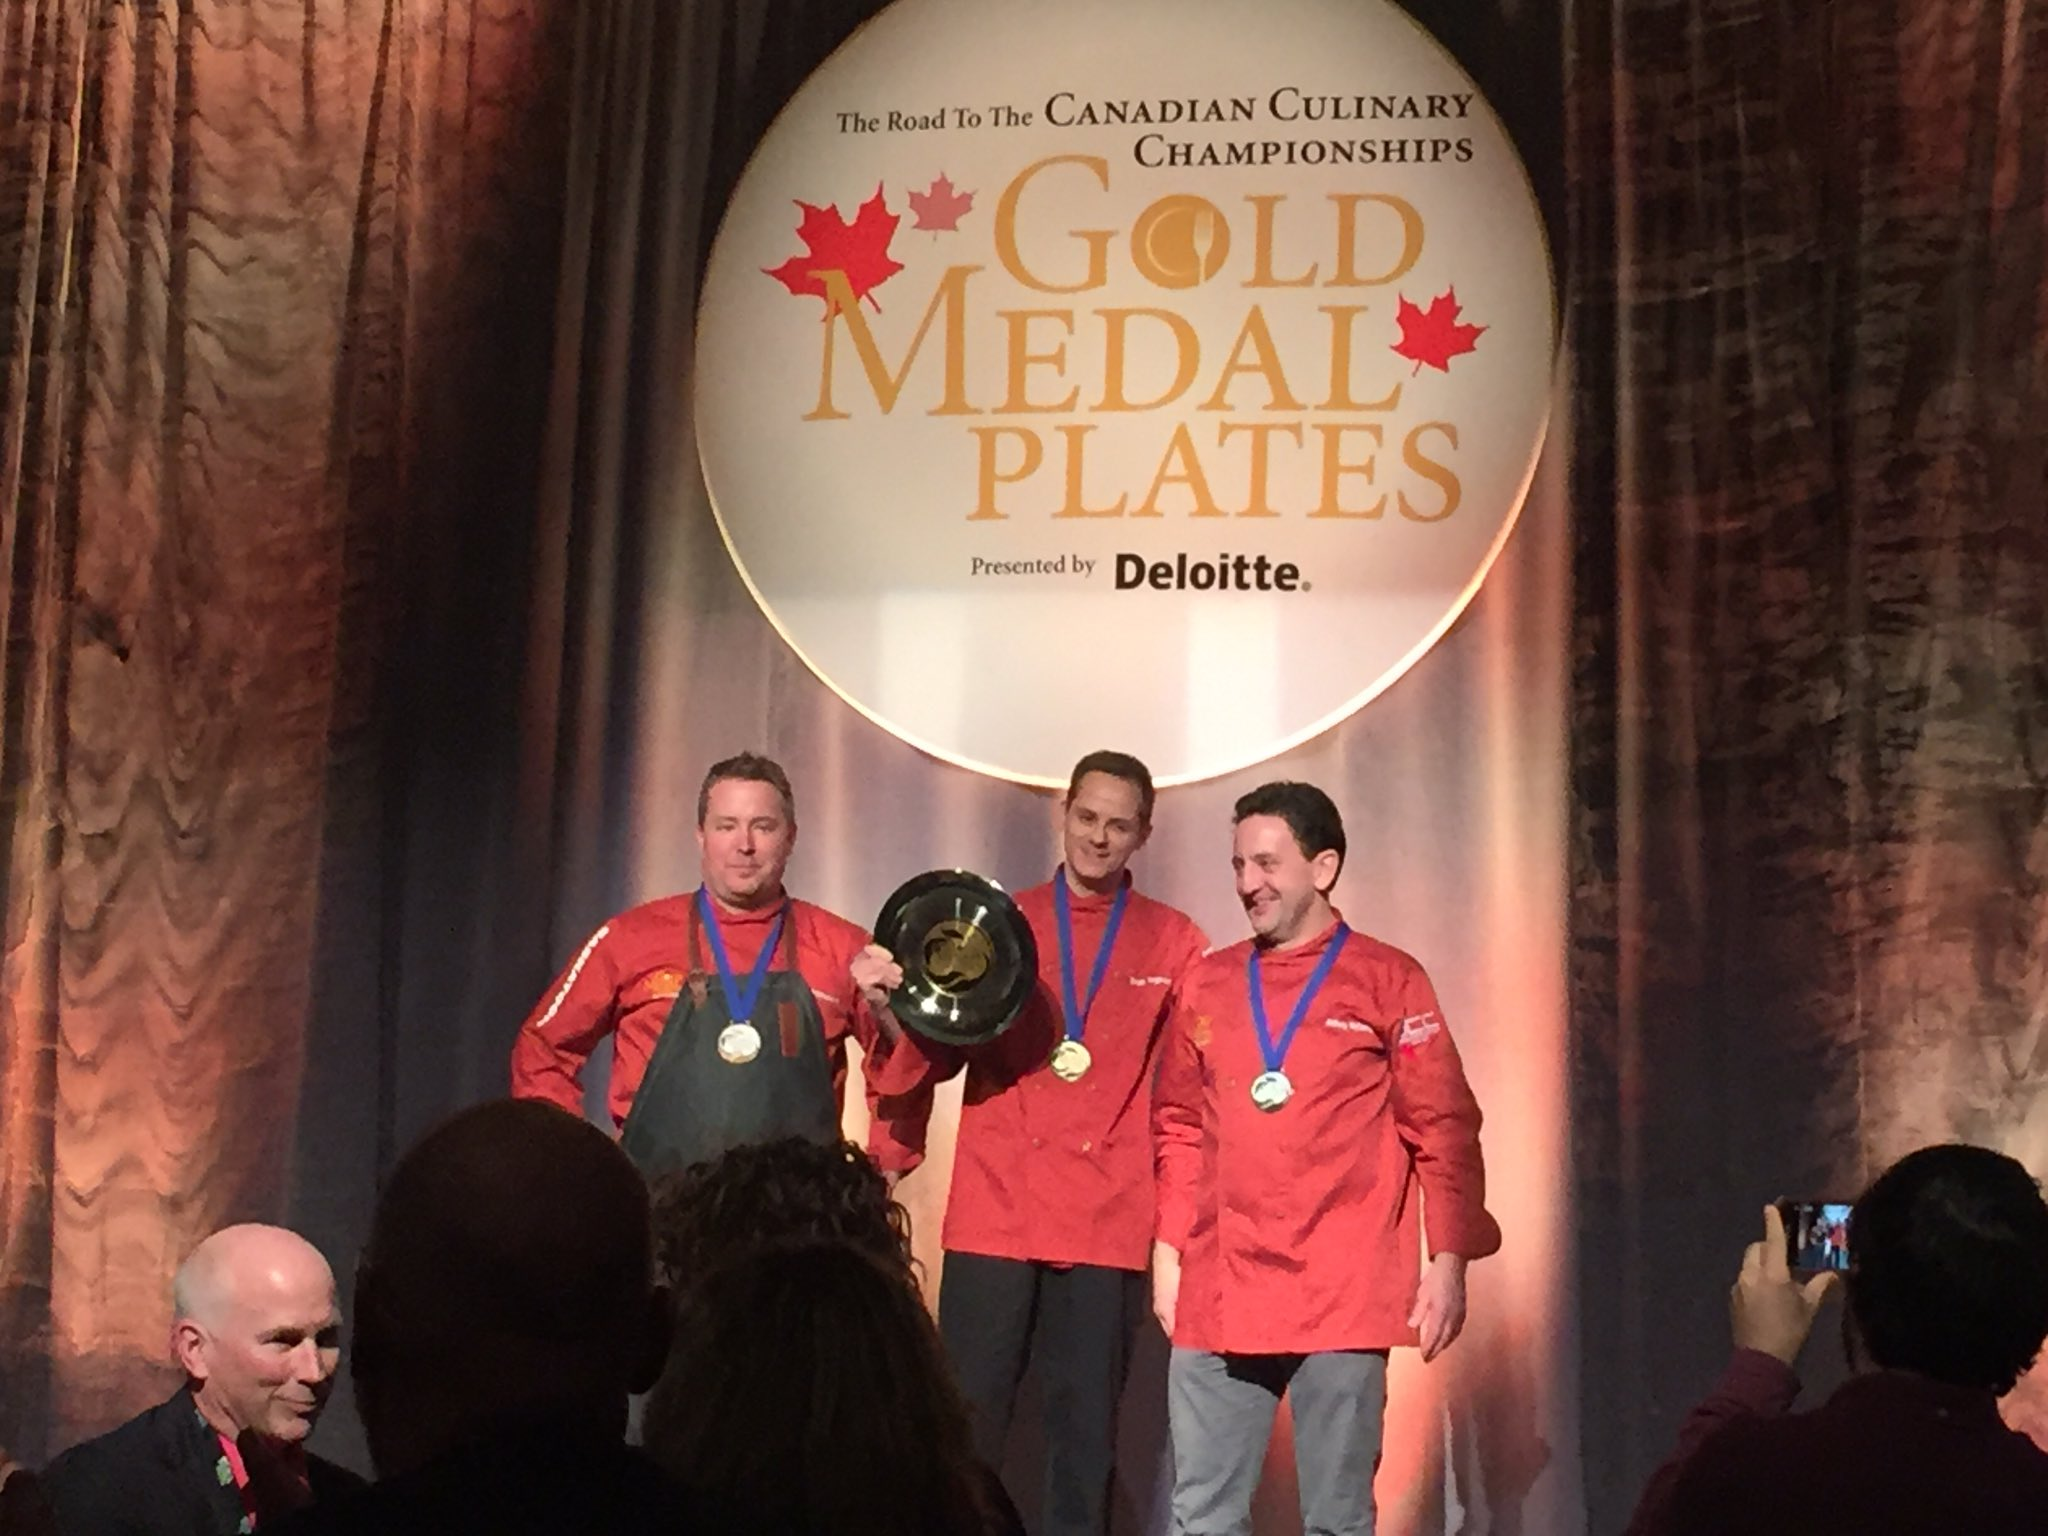 @GoldMedalPlates Chef Scott Torgerson of Aroma Resto Bar & Radison Hotel wins Gold!  @mooncurser wins best wine  in #Saskatoon! #myGMP https://t.co/Wclvv2Qgao